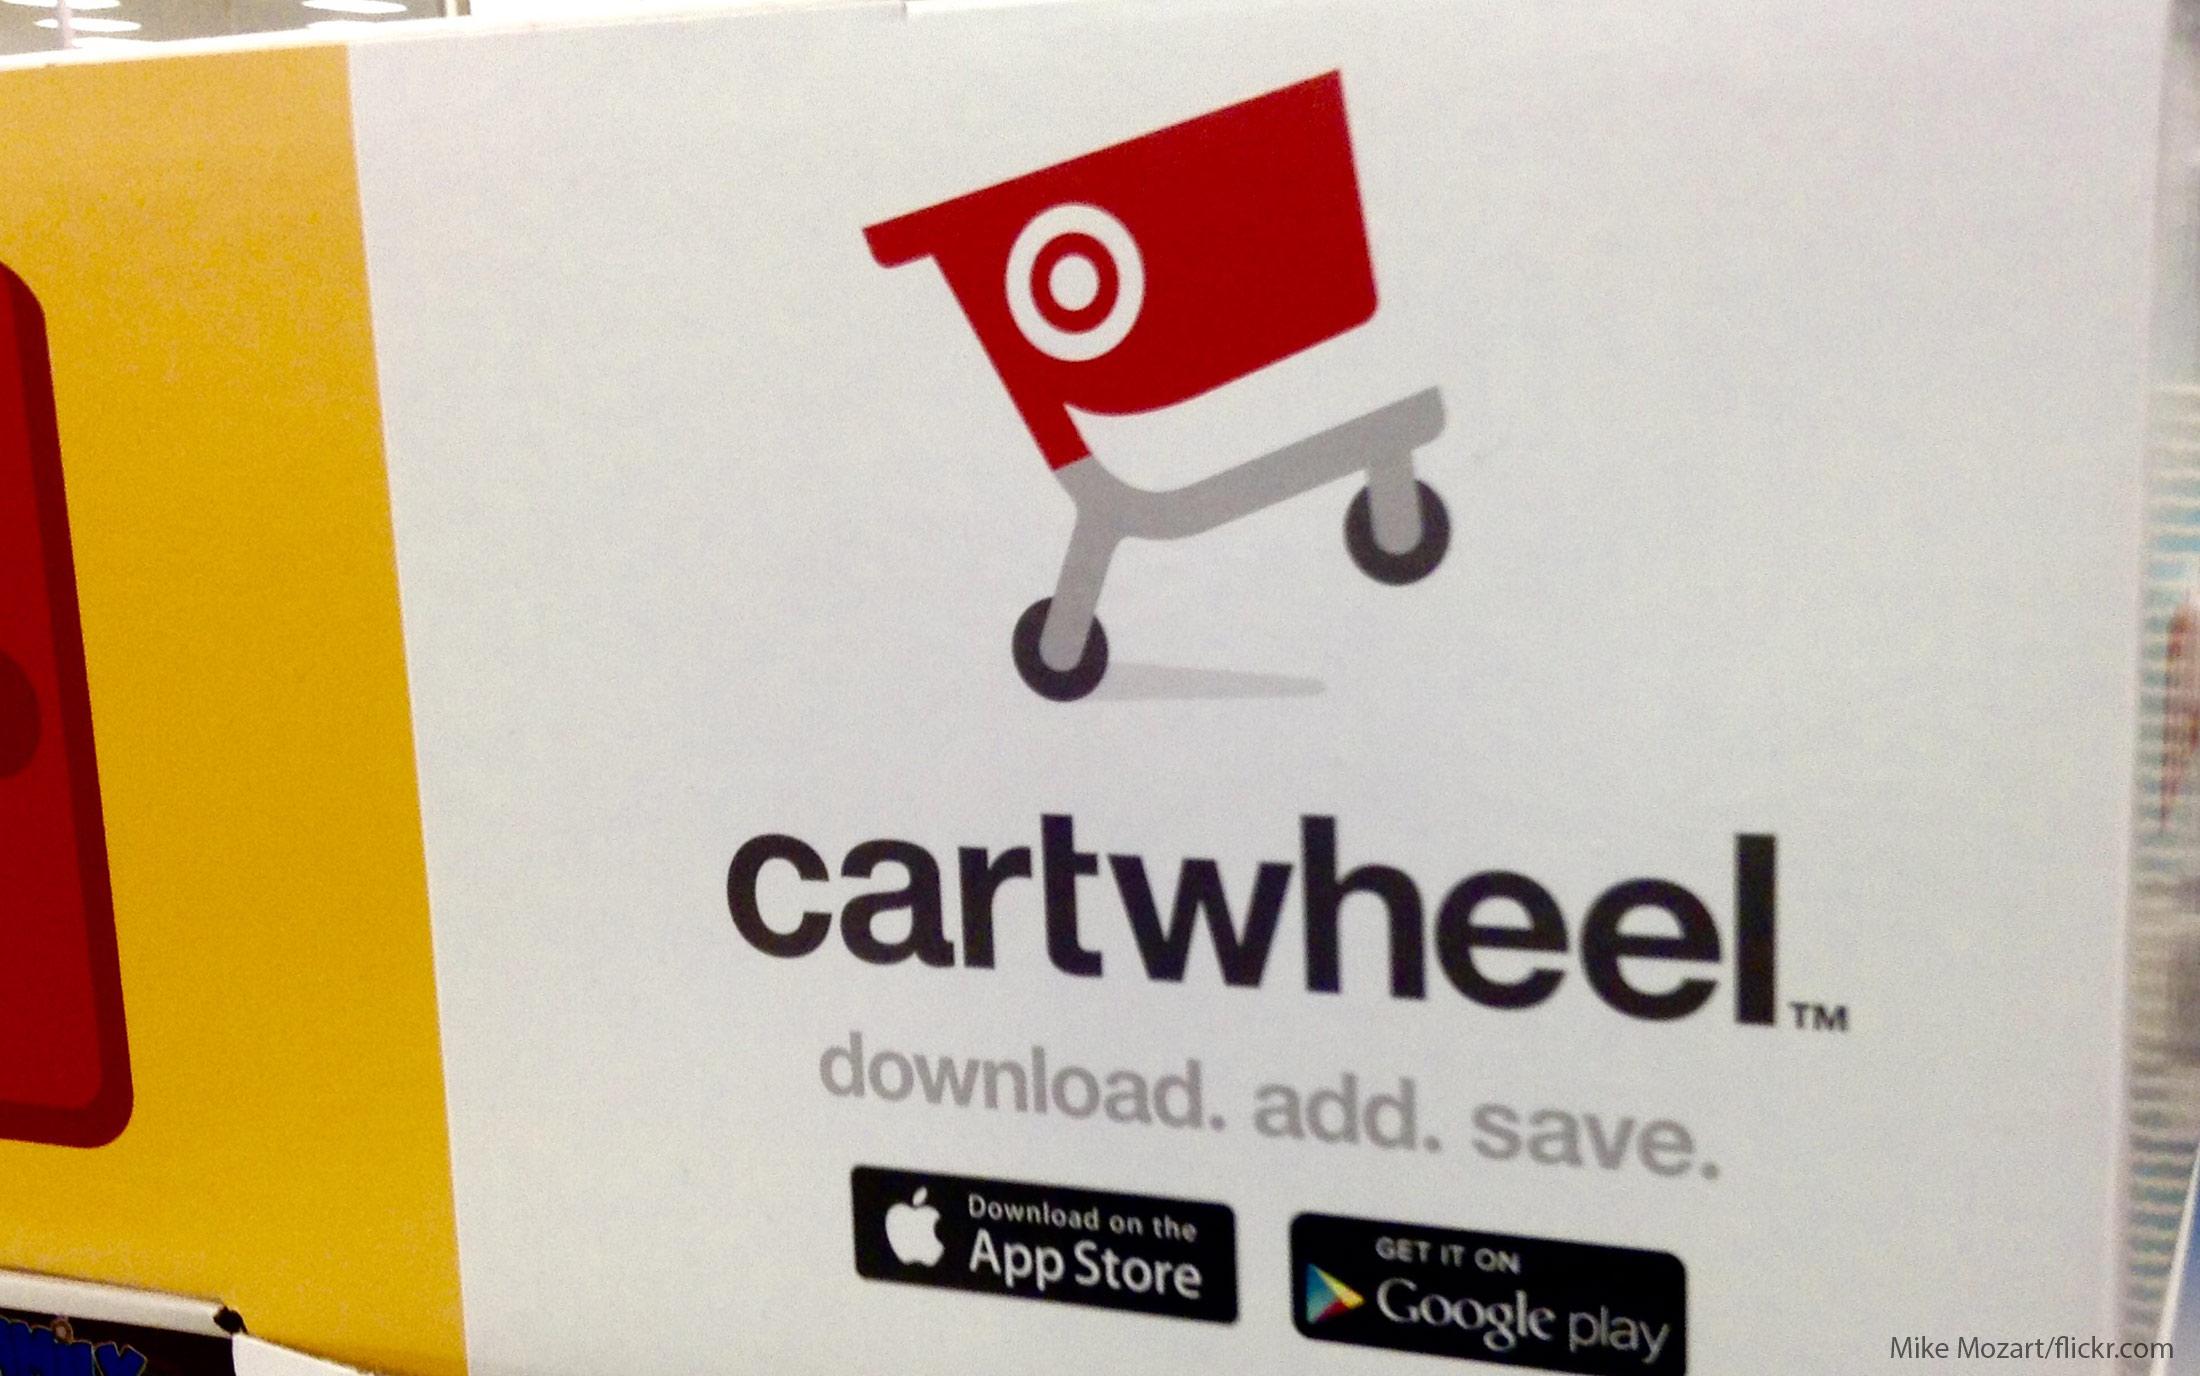 The secret garden coloring book target - Target Cartwheel App